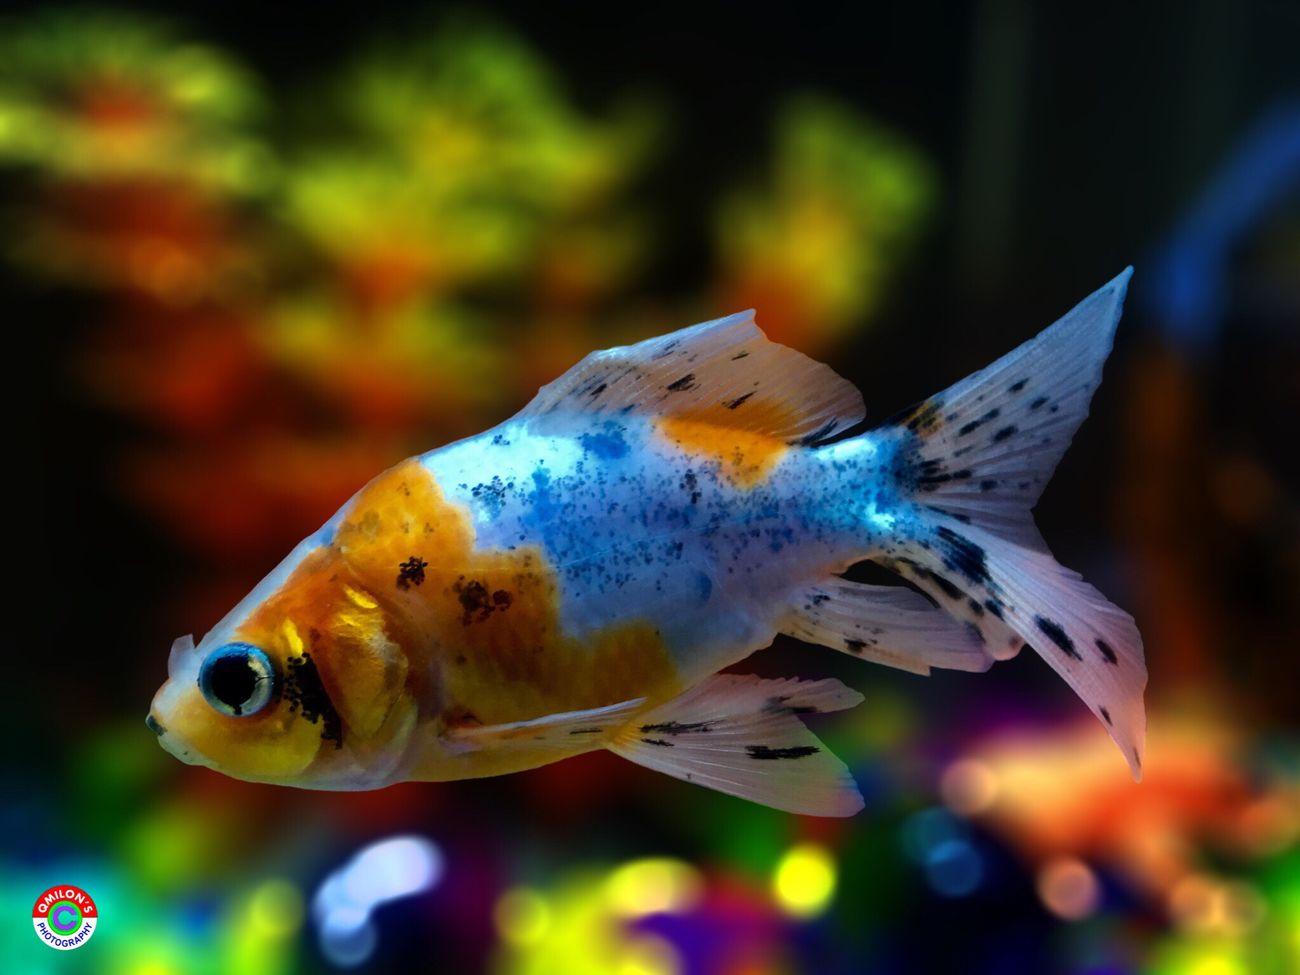 Fish aquarium in bangladesh - Fish Aquarium Taking Photos Enjoying Nature Nature Eyeem Nature Lover Aquariumfish Aquarium Beauty Aquarium Photography Eyeem